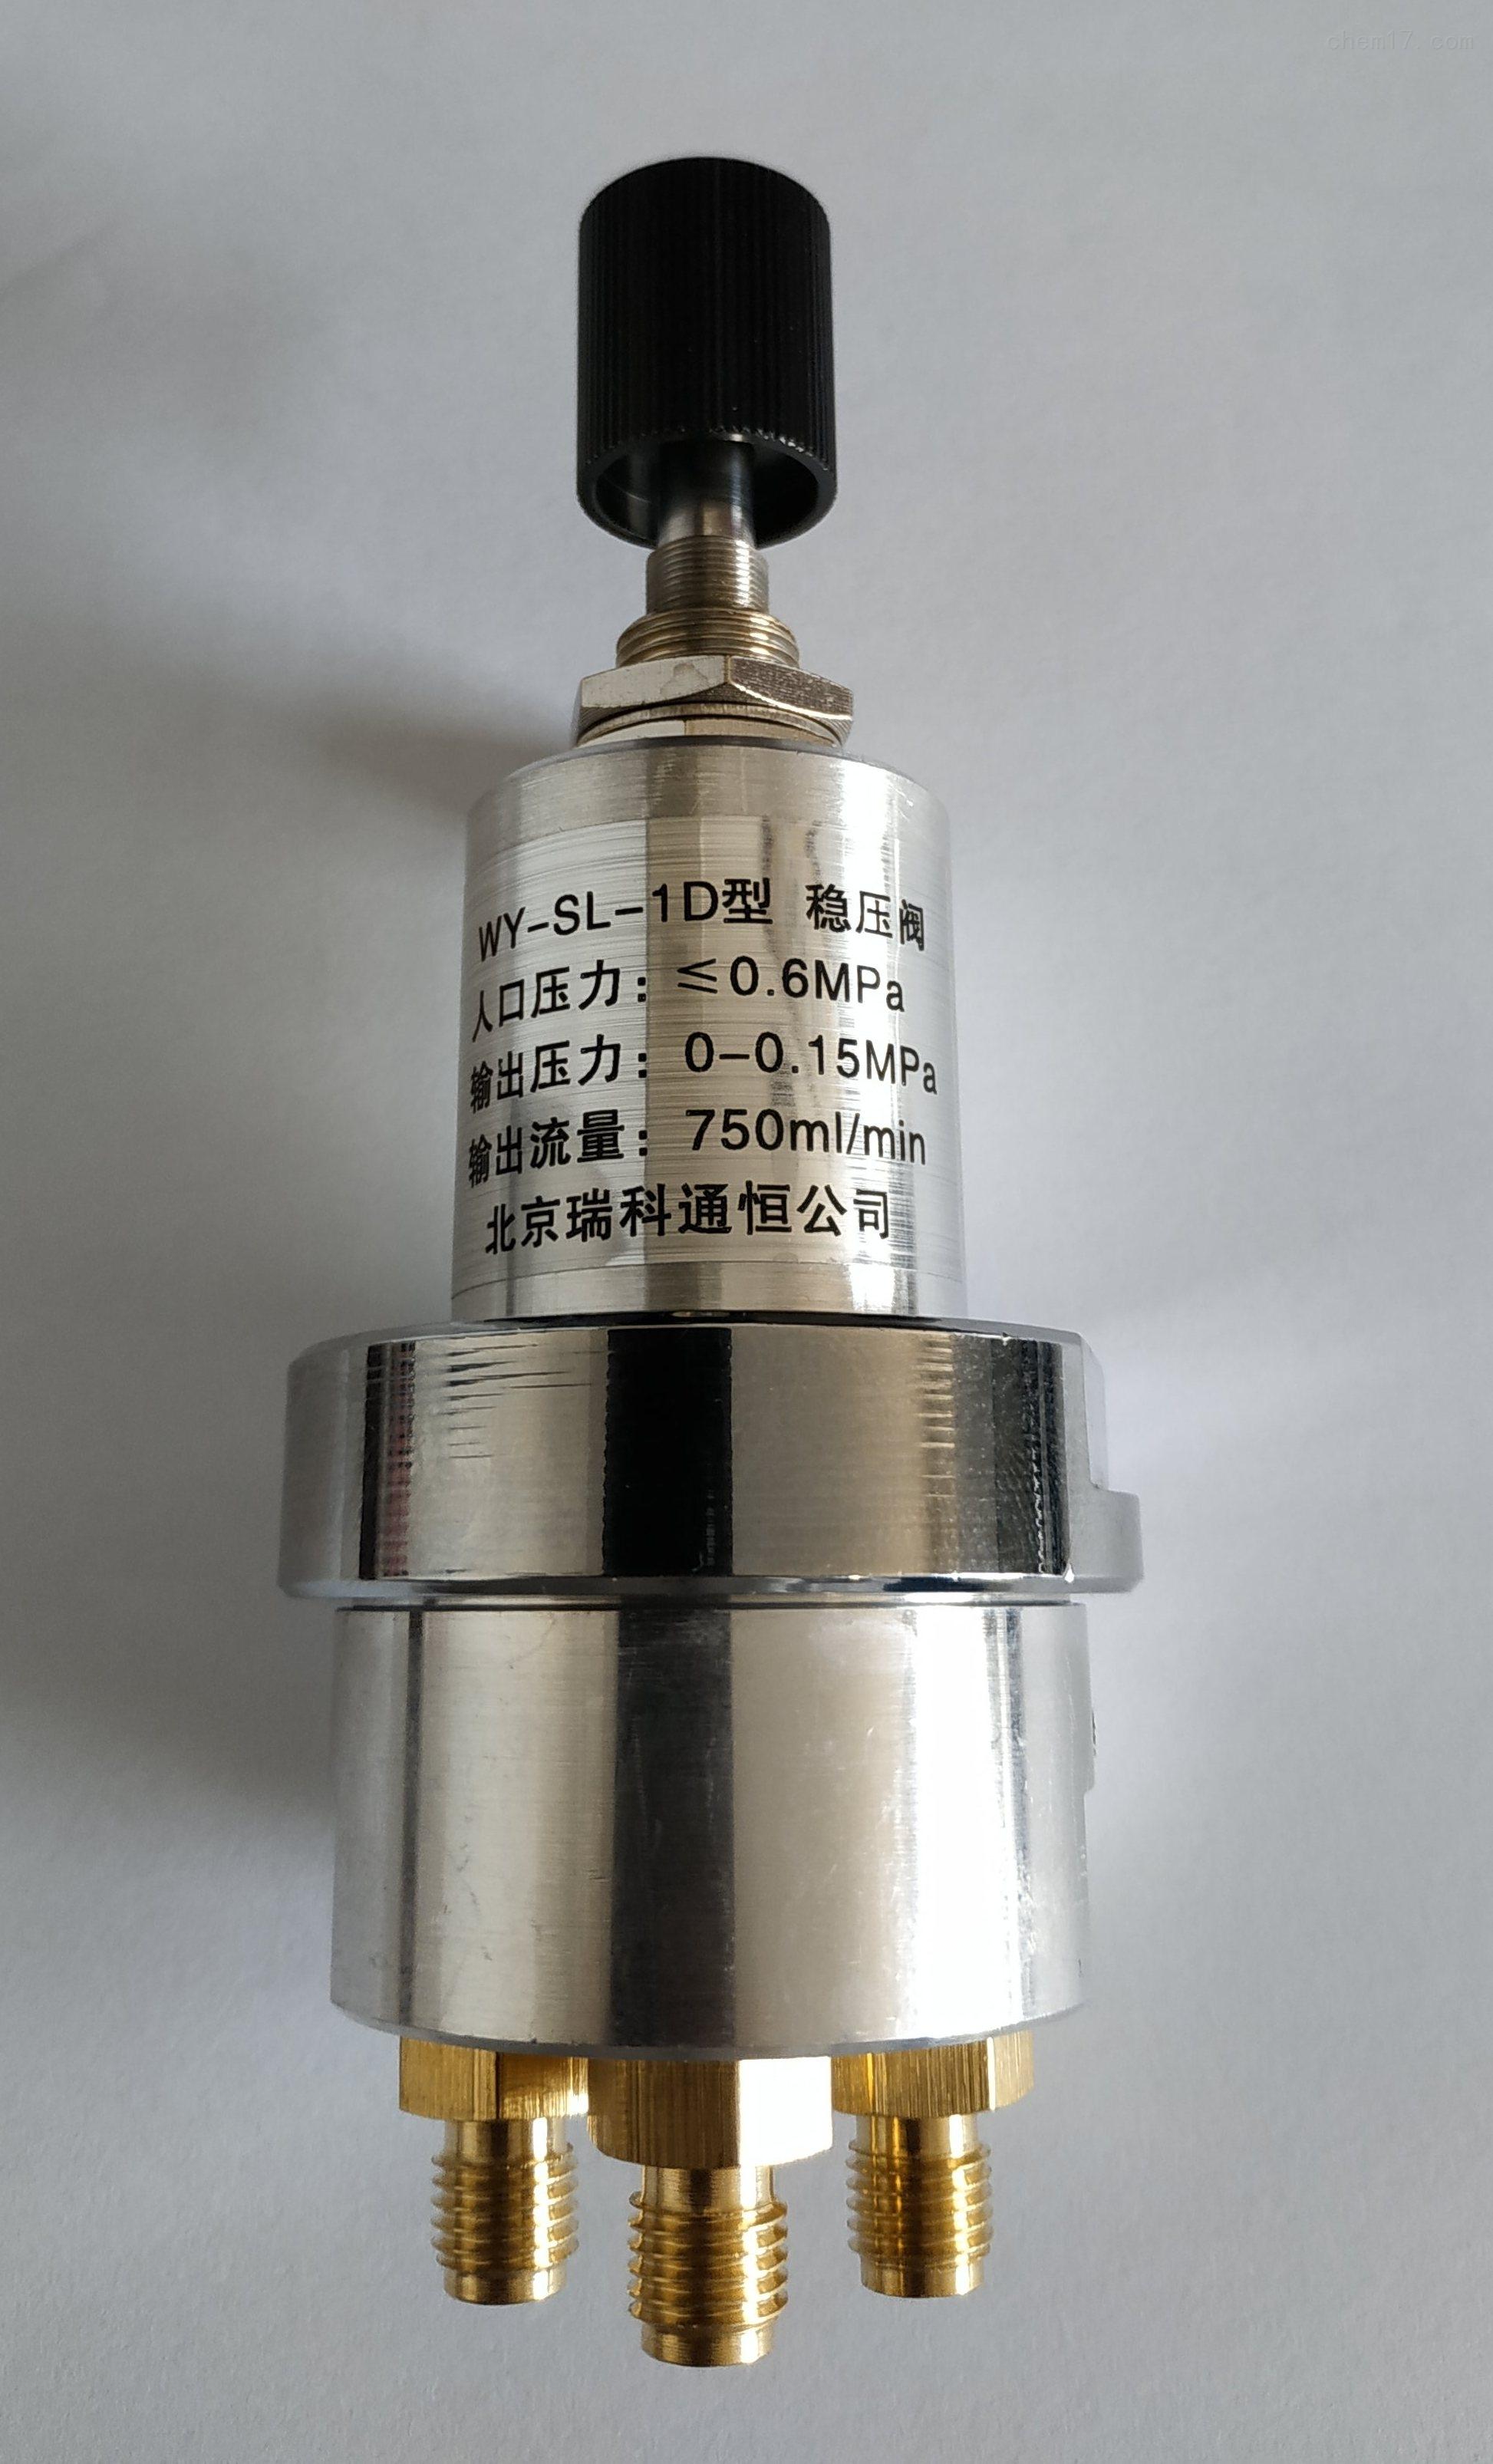 WY-SL-1D型低壓穩壓閥